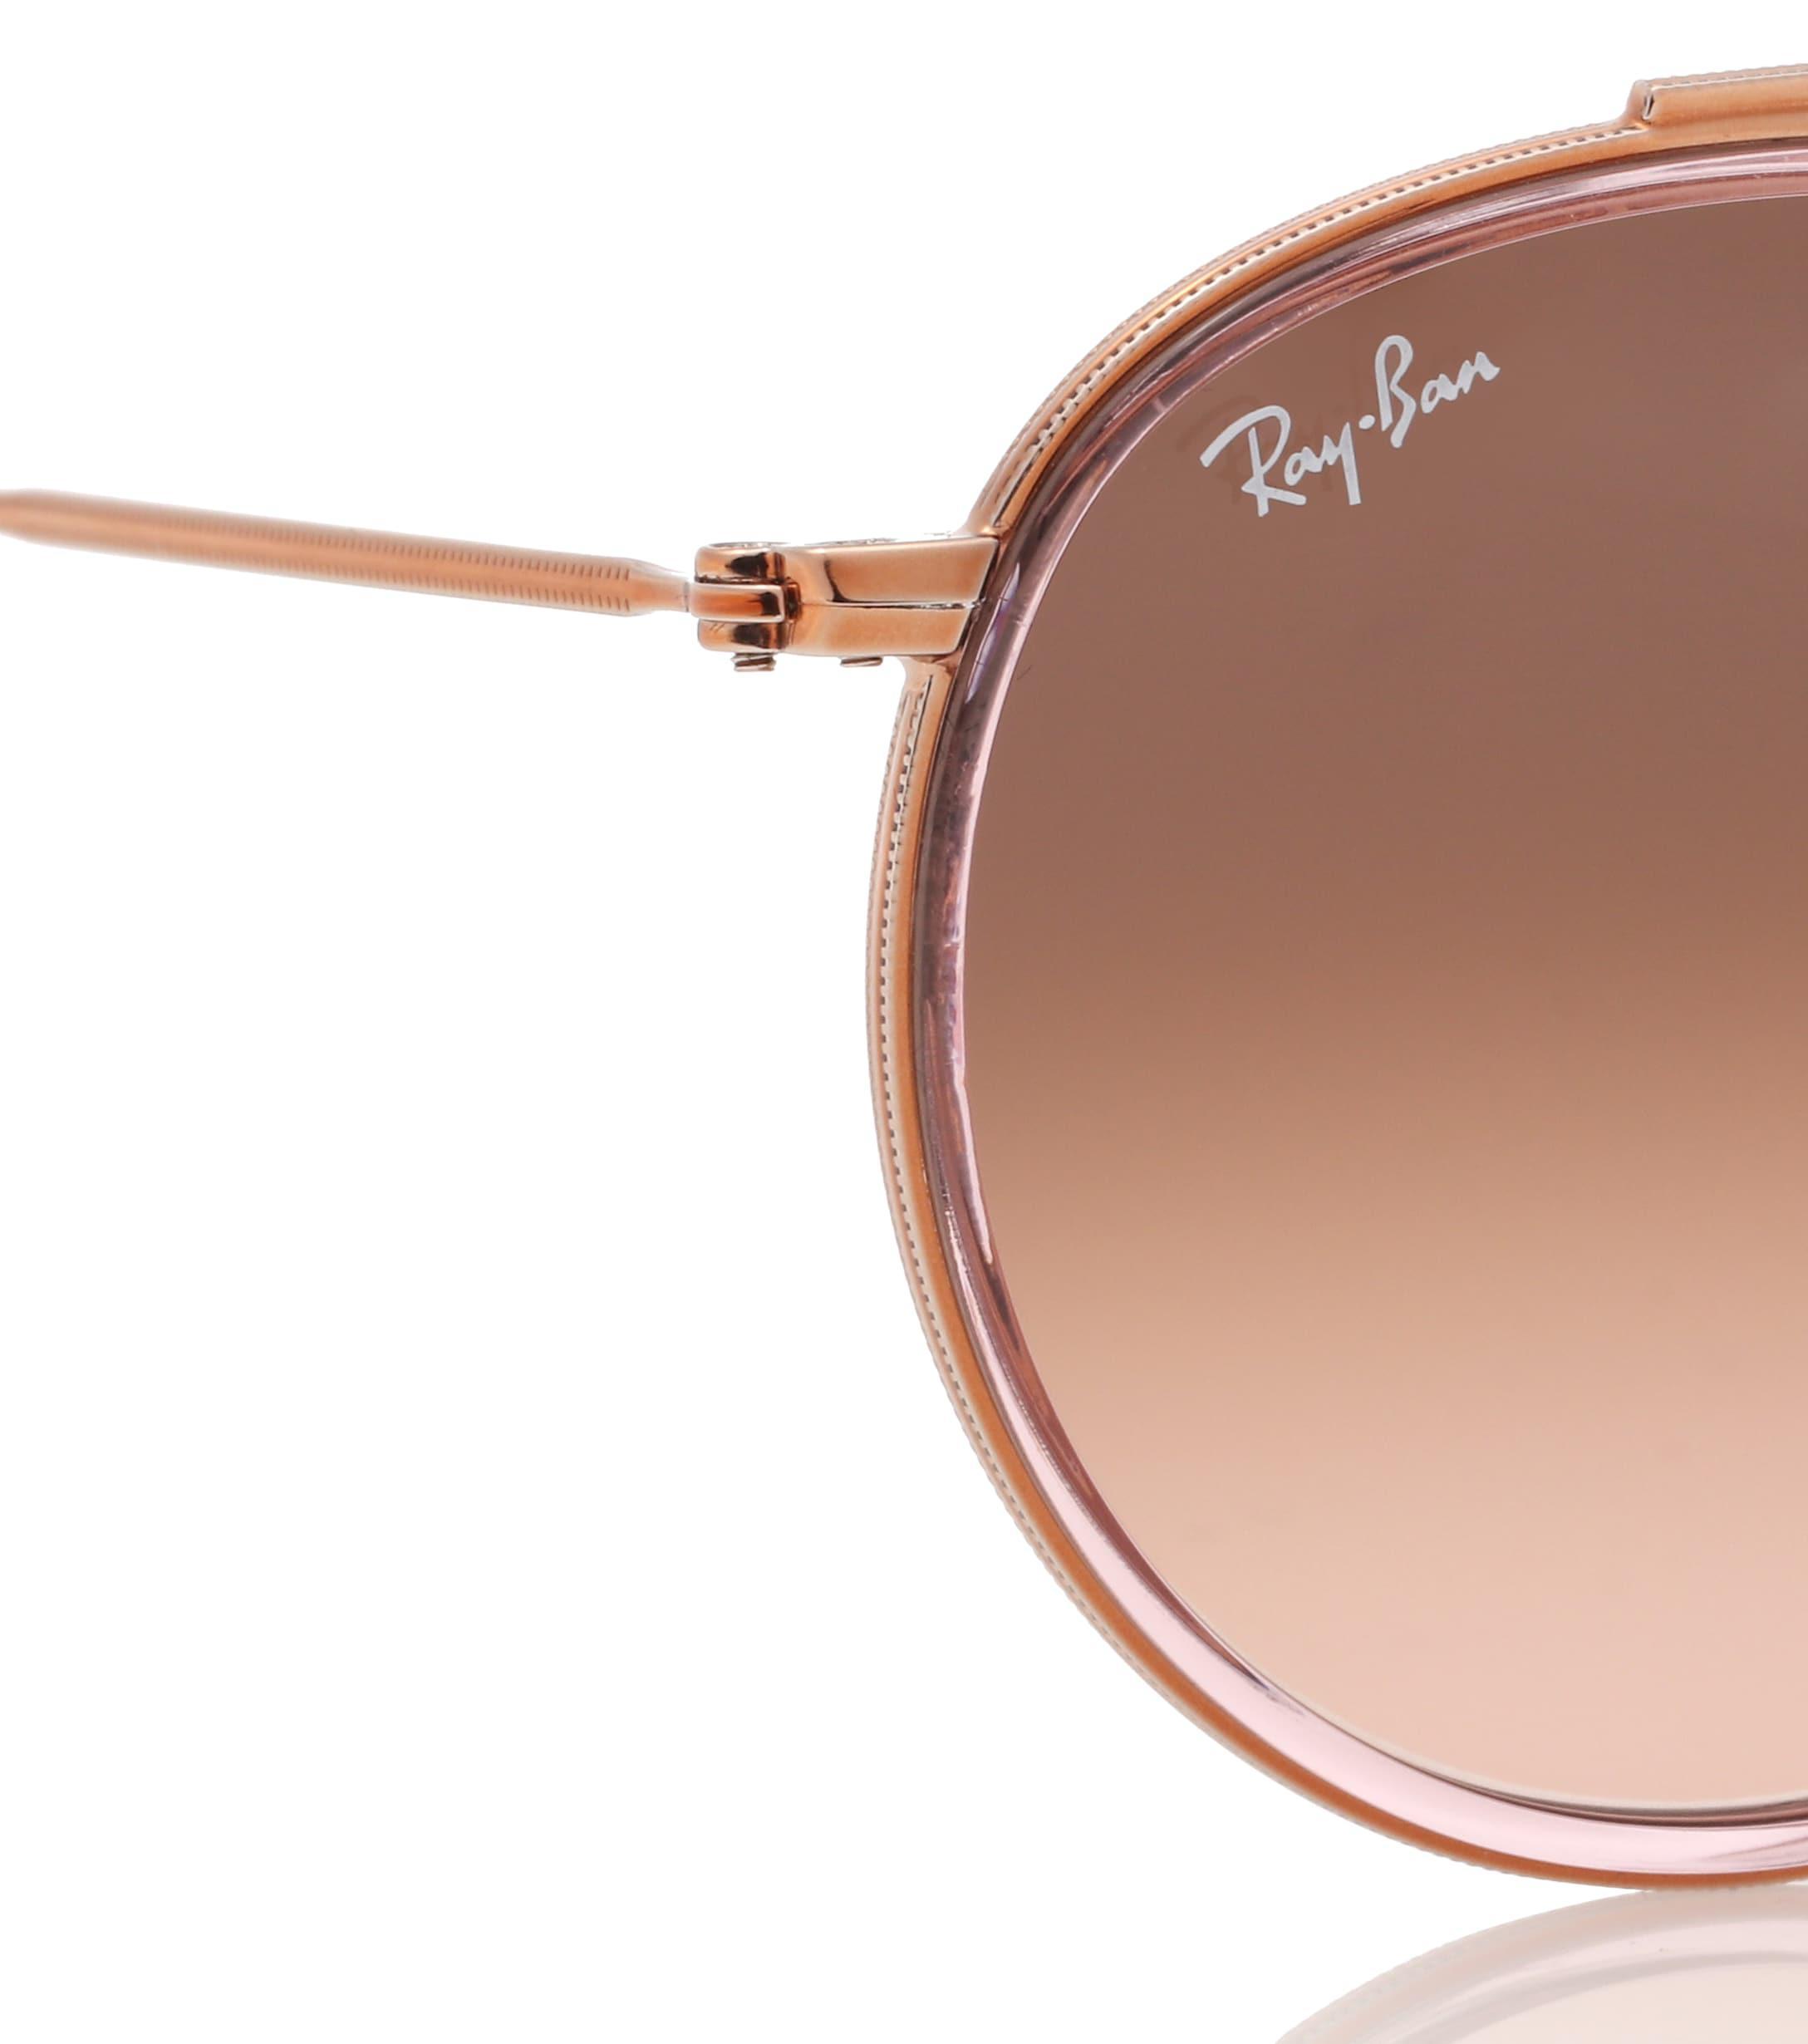 95910b321d4 Ray-Ban - Pink Round Double Bridge Sunglasses - Lyst. View fullscreen